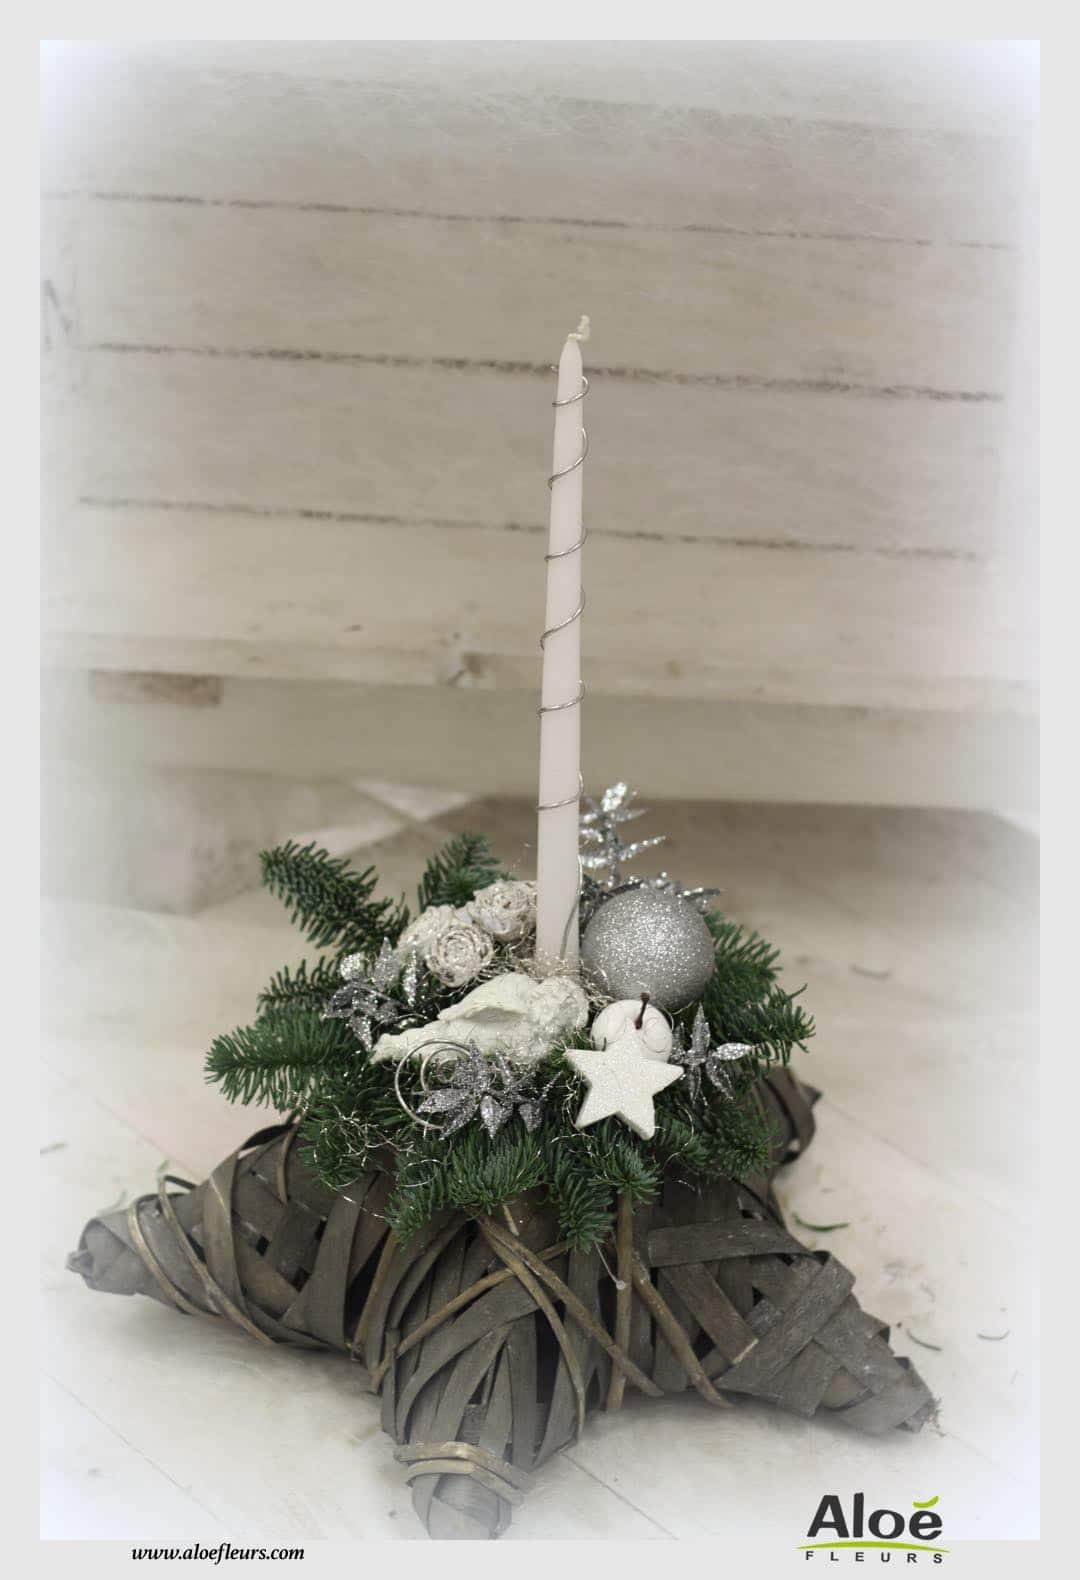 composition florale de noel sapin alo fleurs31 aloe fleurs. Black Bedroom Furniture Sets. Home Design Ideas